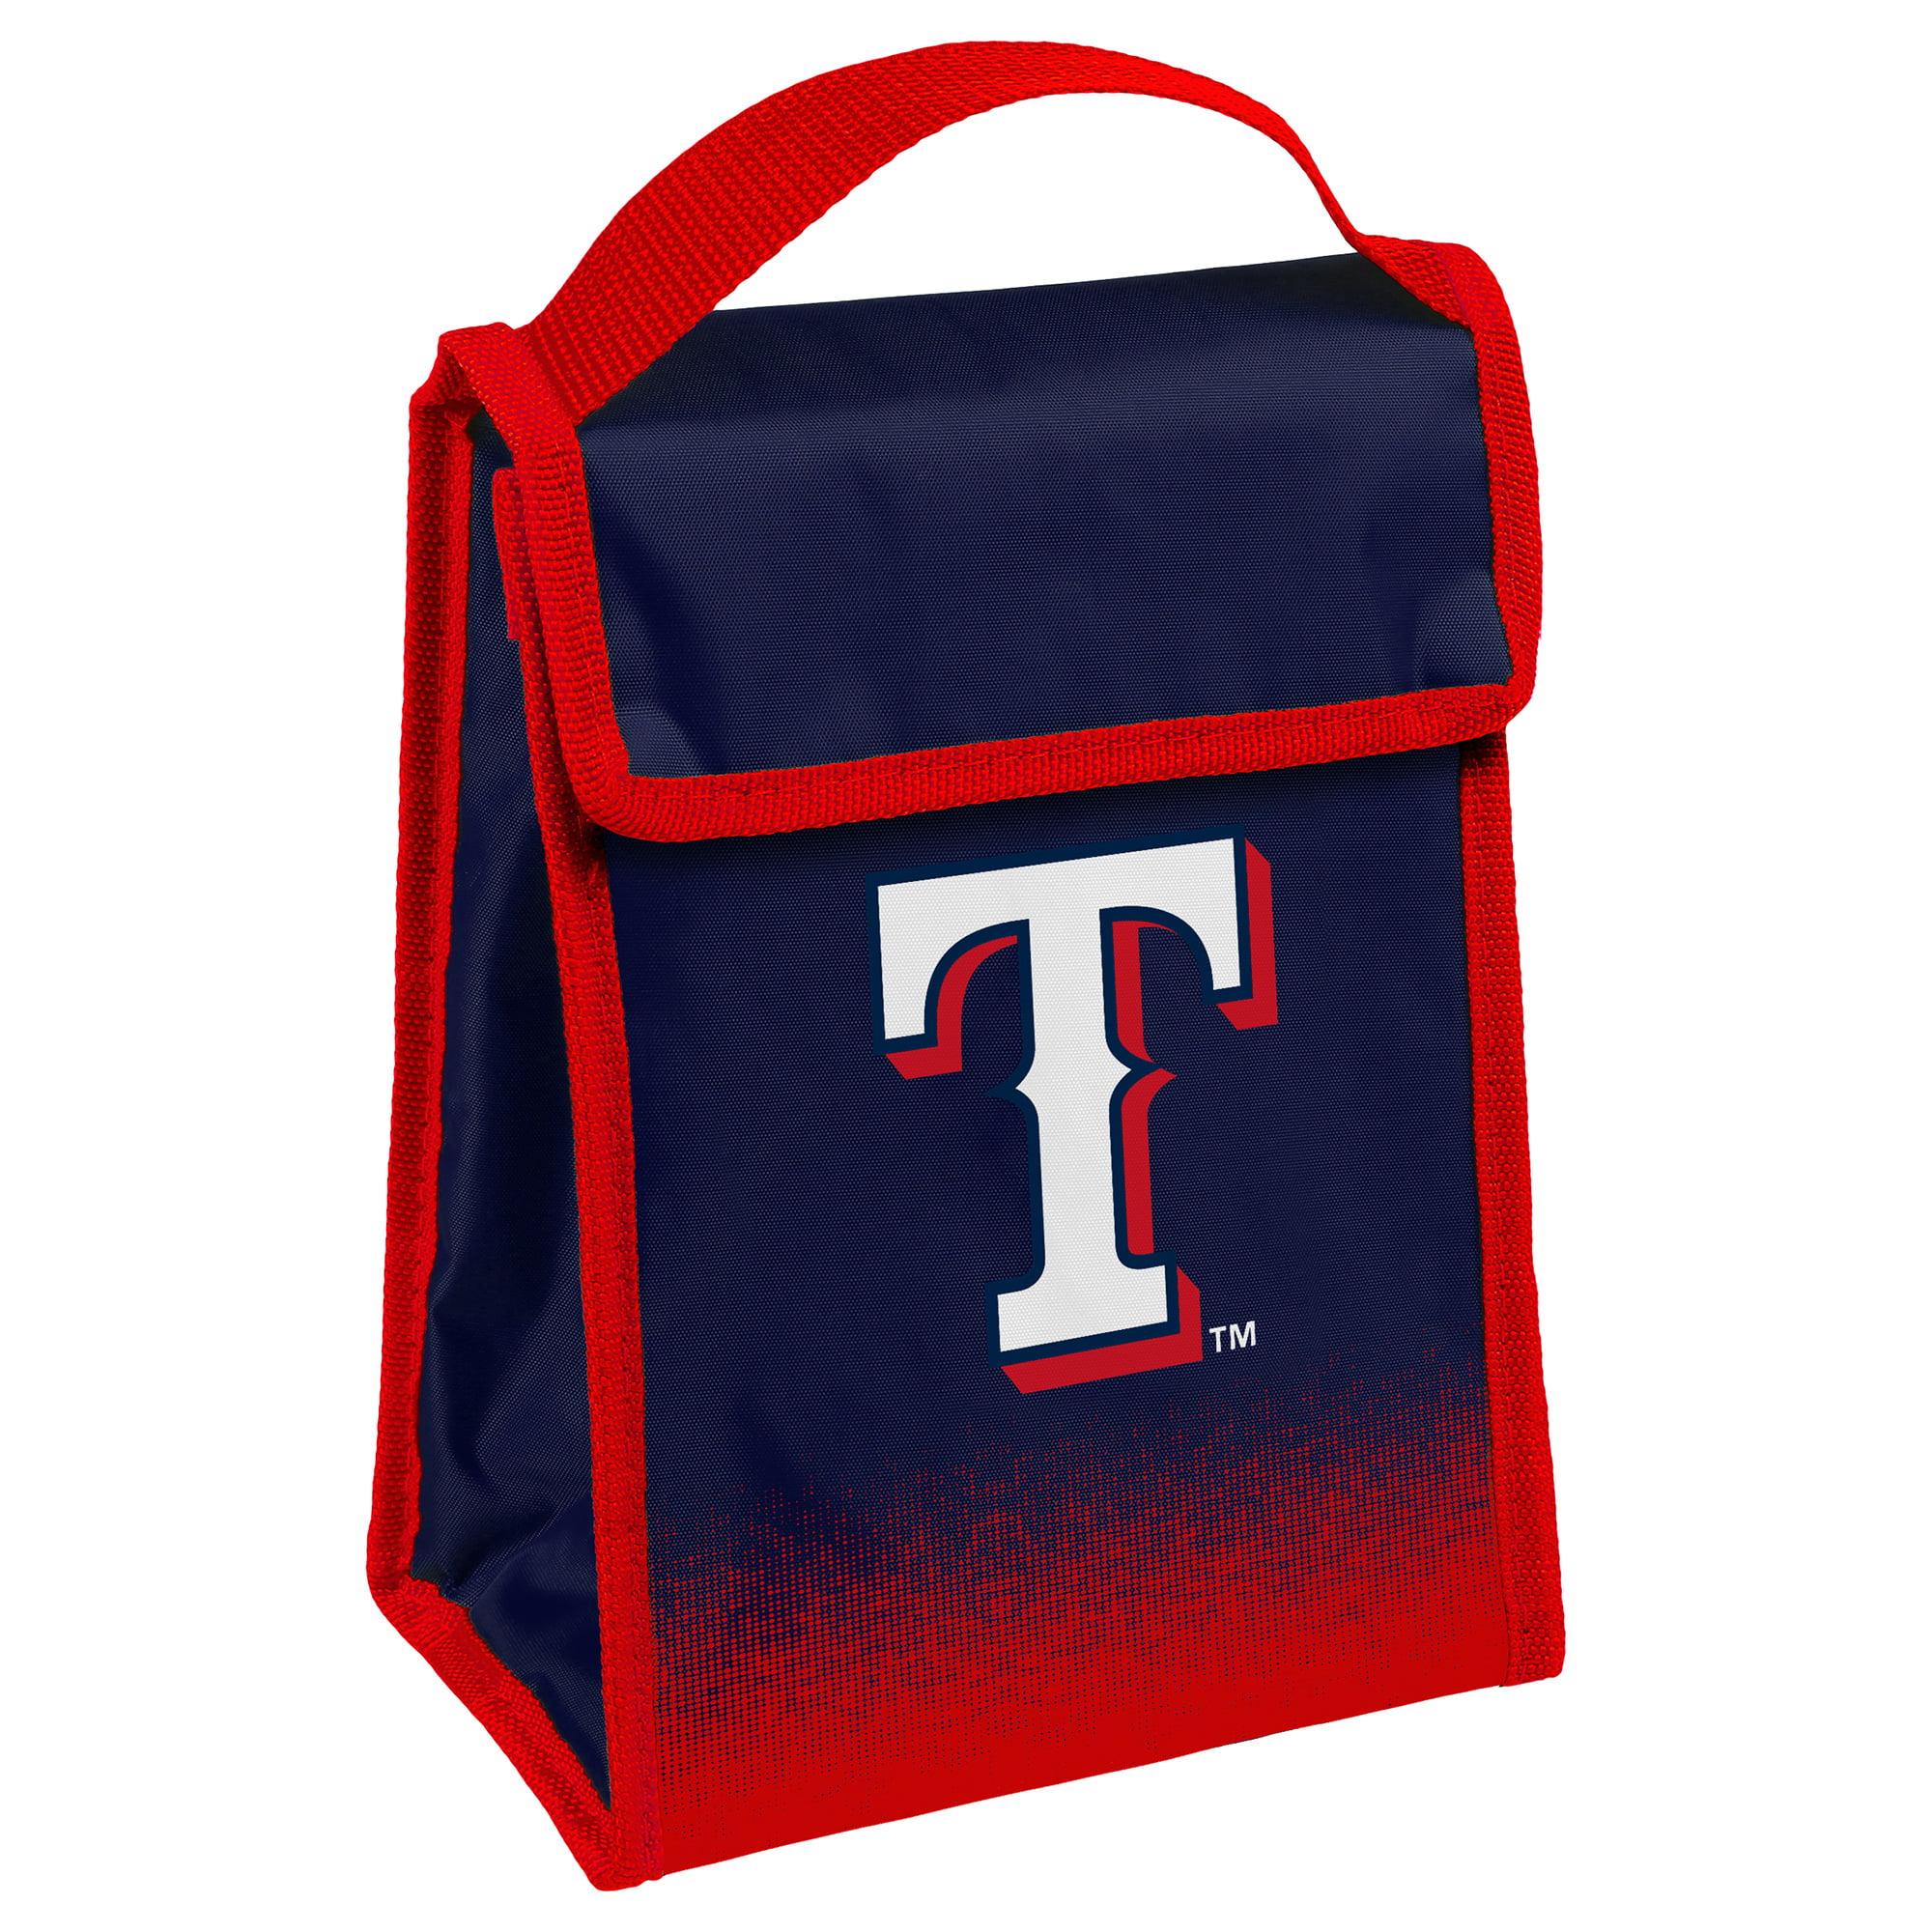 Texas Rangers Gradient Lunch Bag - No Size